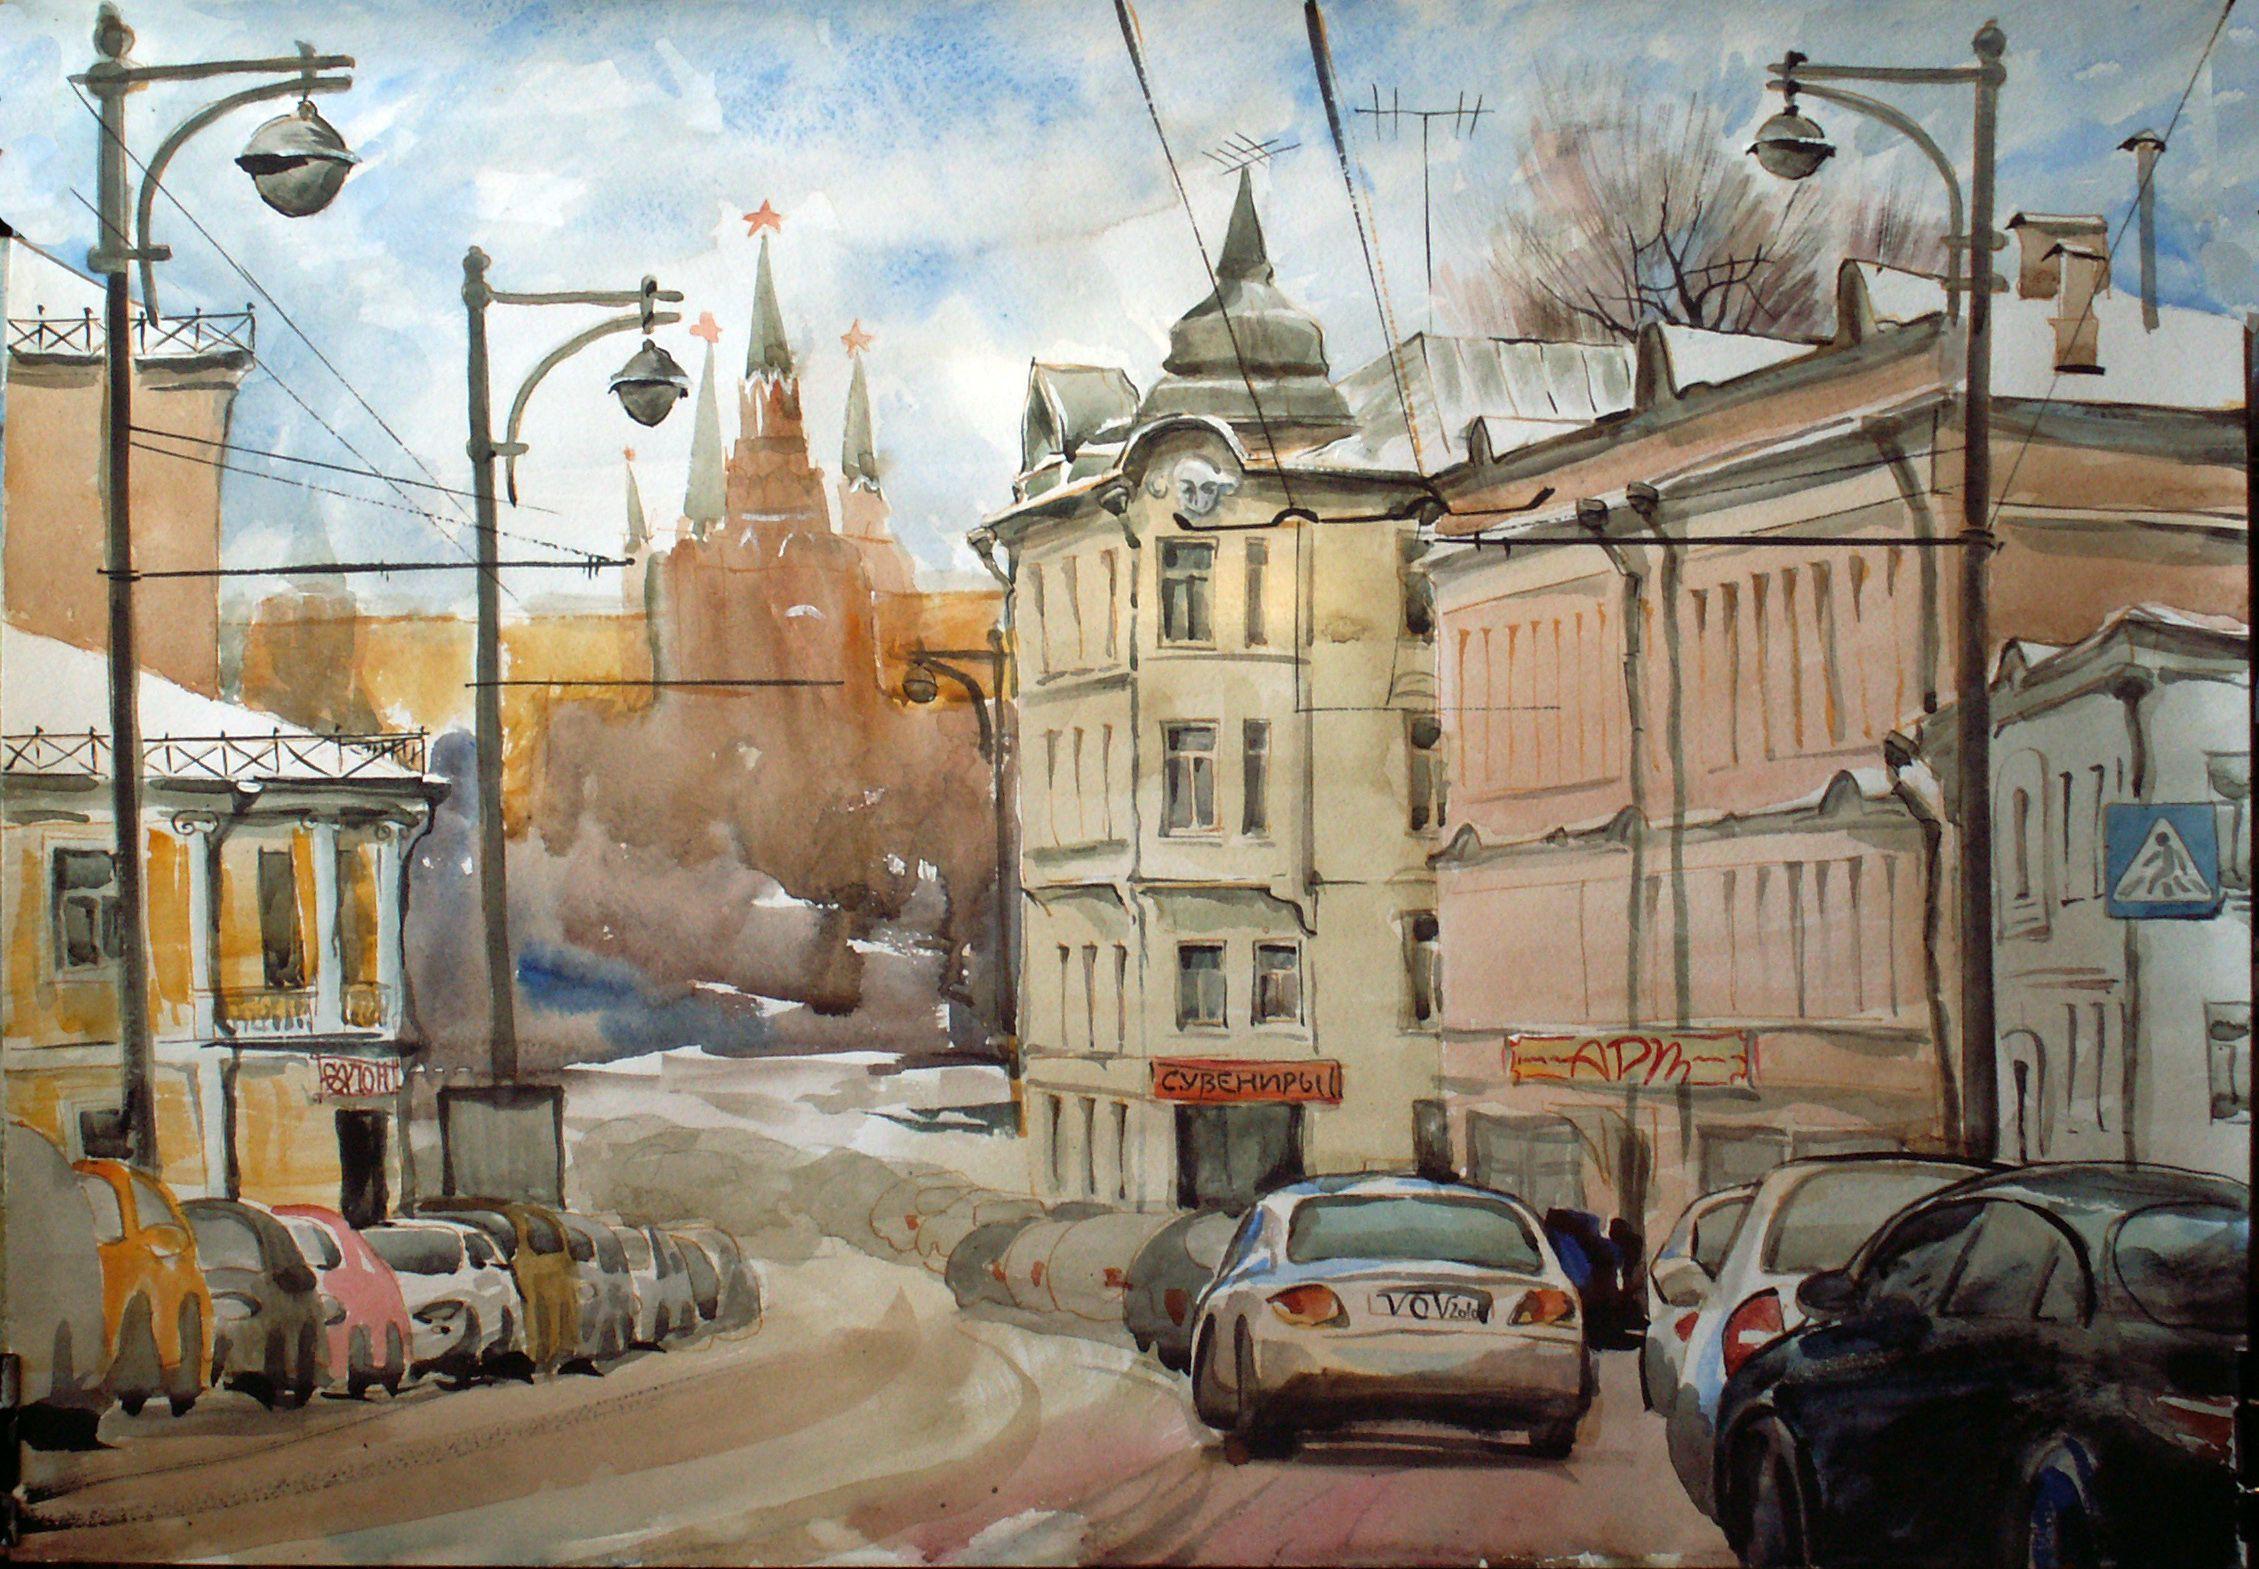 Композиция картинки города, погибшим керчи гиф